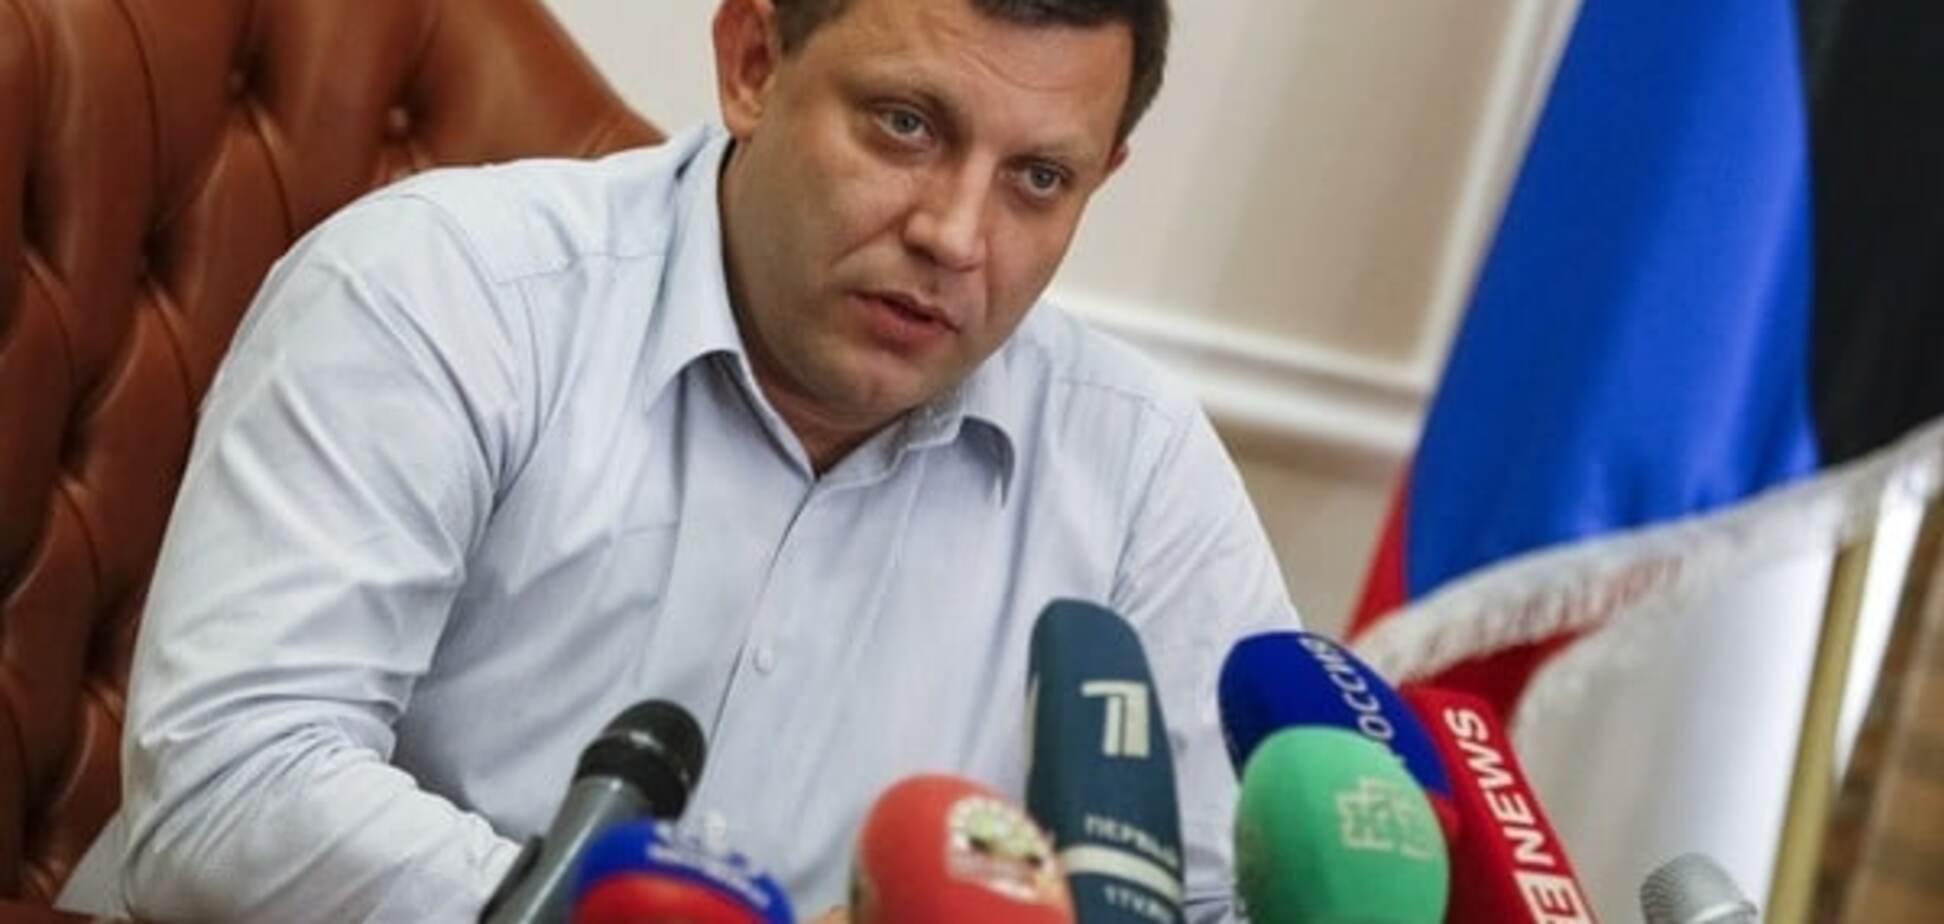 Захарченко предупредил о последствиях лишения гражданства за сепаратизм